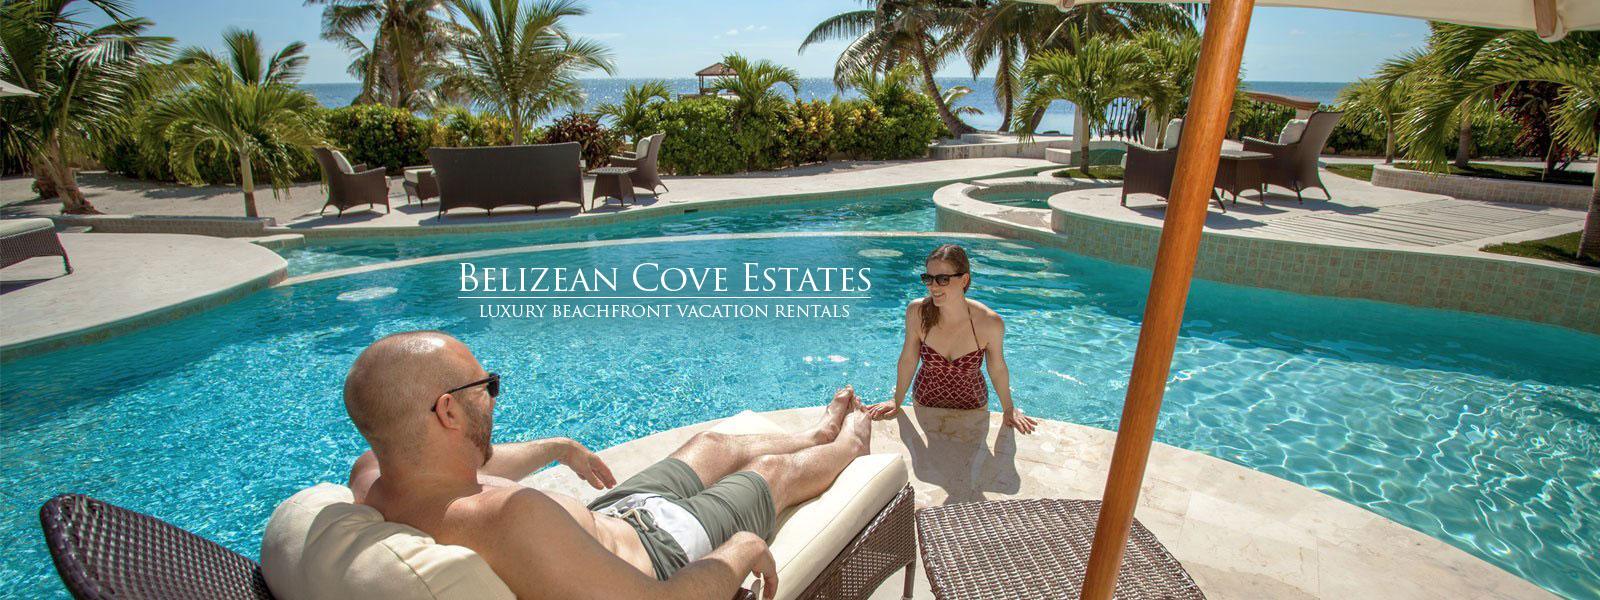 Luxurious Pools at Belizean Cove Estates in Belize